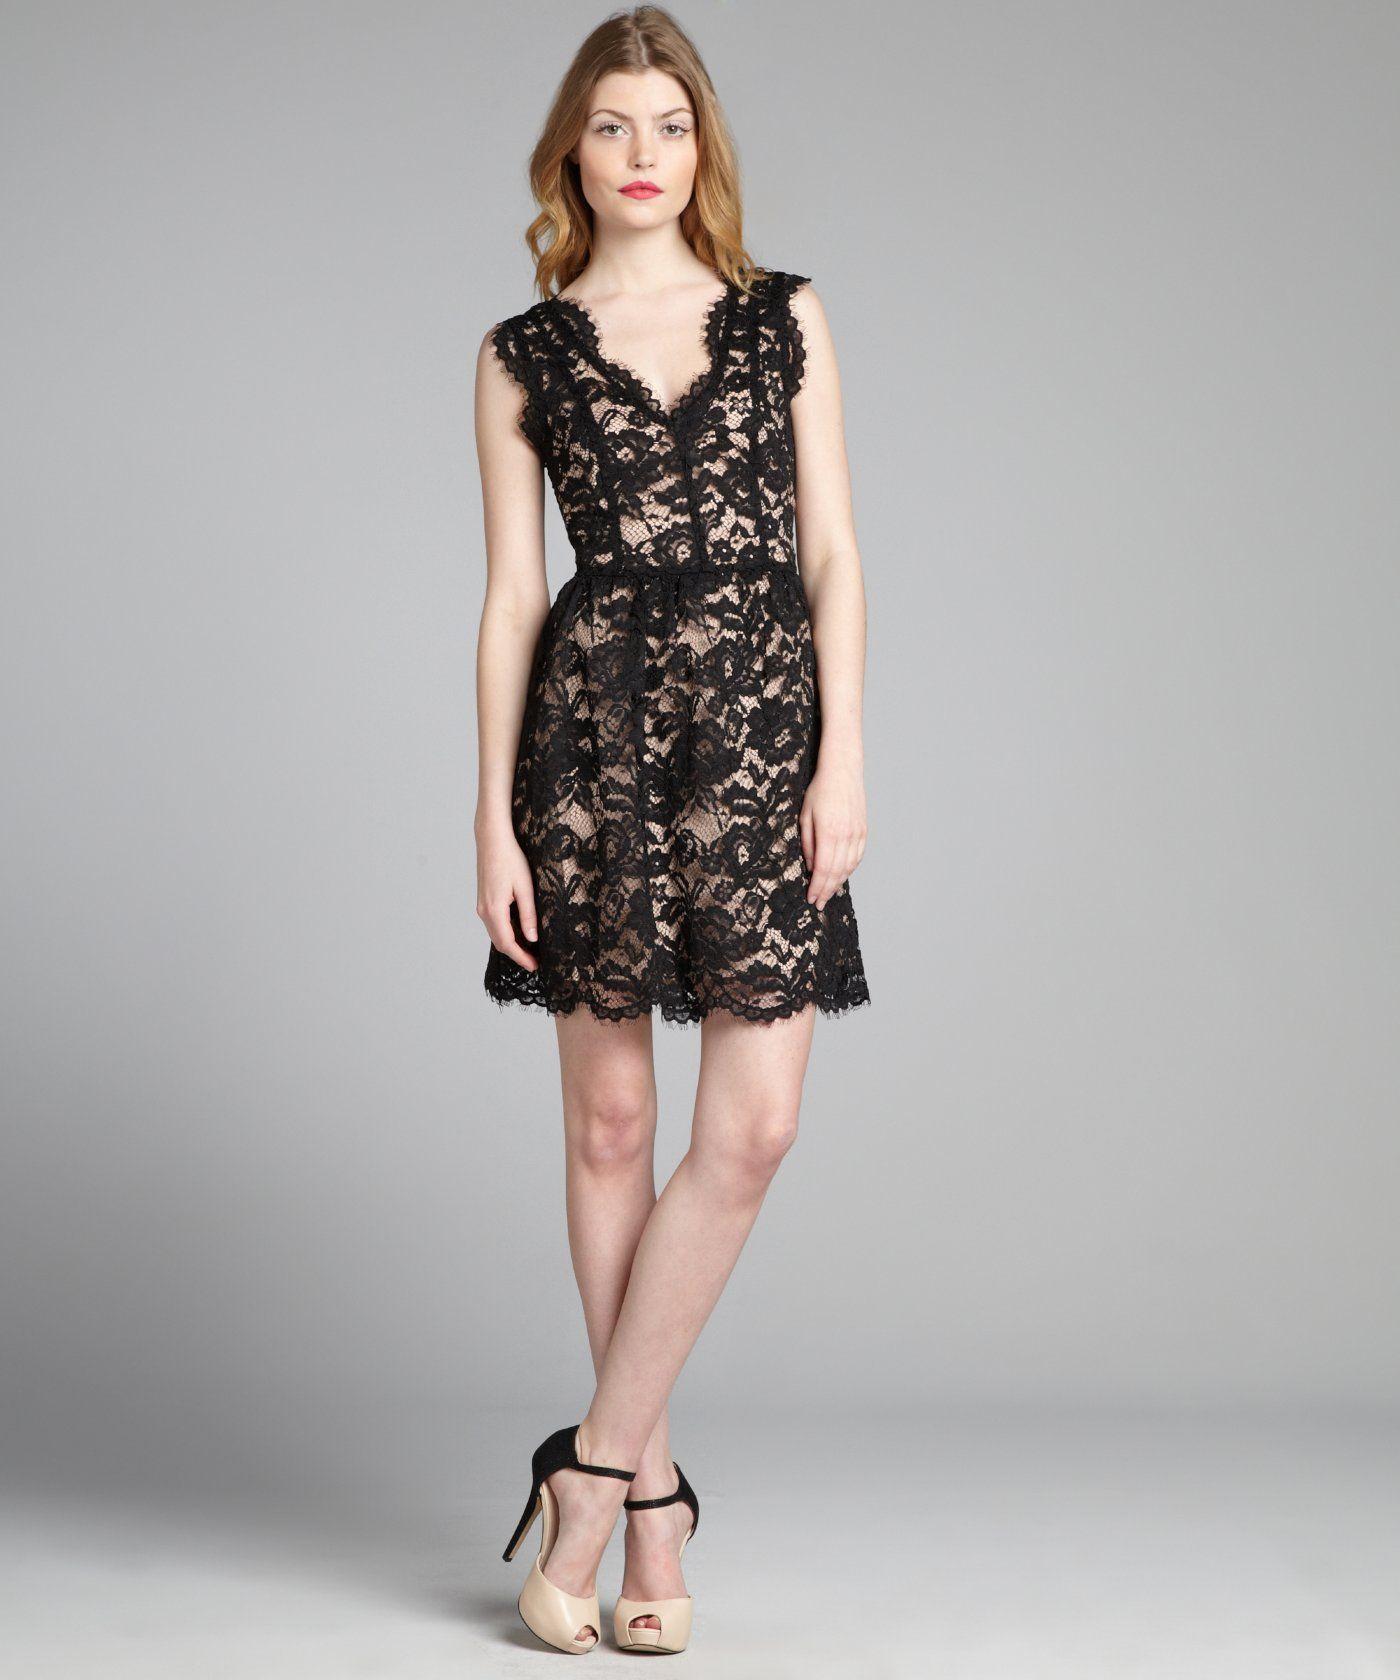 V neck black lace dress  Wyatt black lace scalloped vneck sleeveless dress  All things Chic